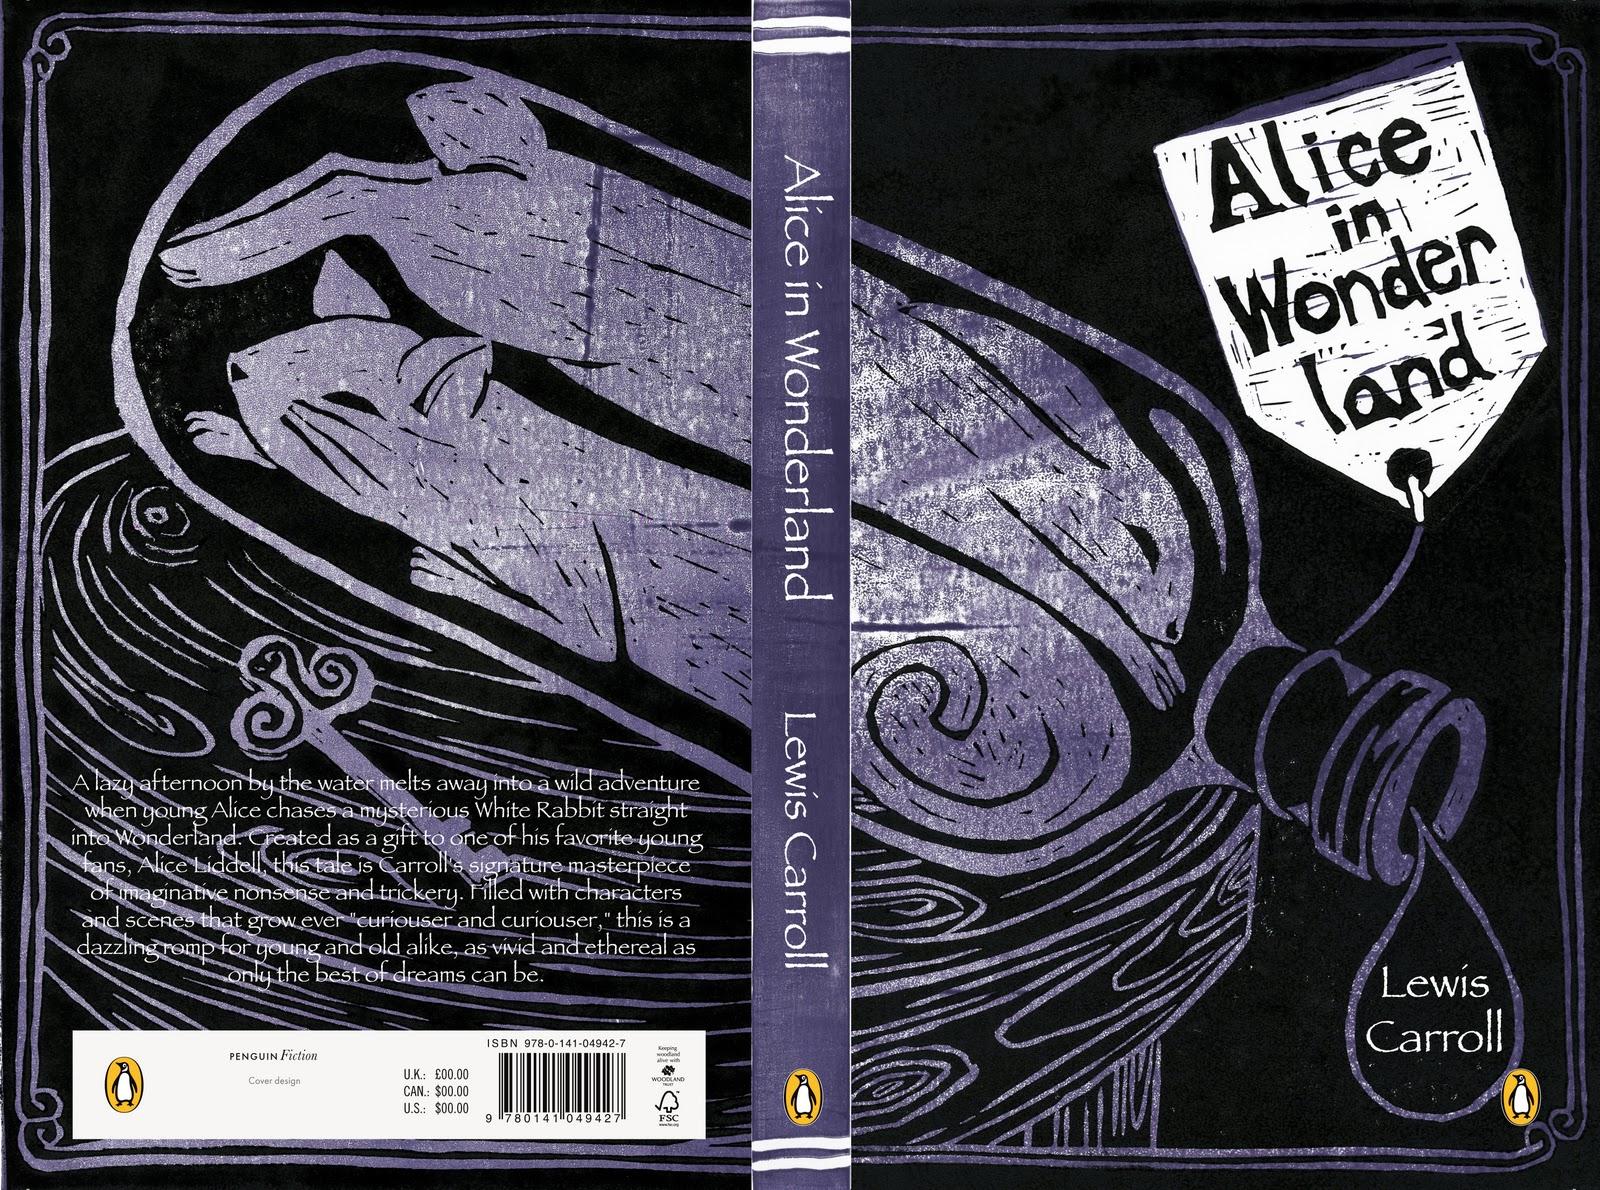 Alice In Wonderland Book Cover Designs : Penguin design awards alice in wonderland sophie